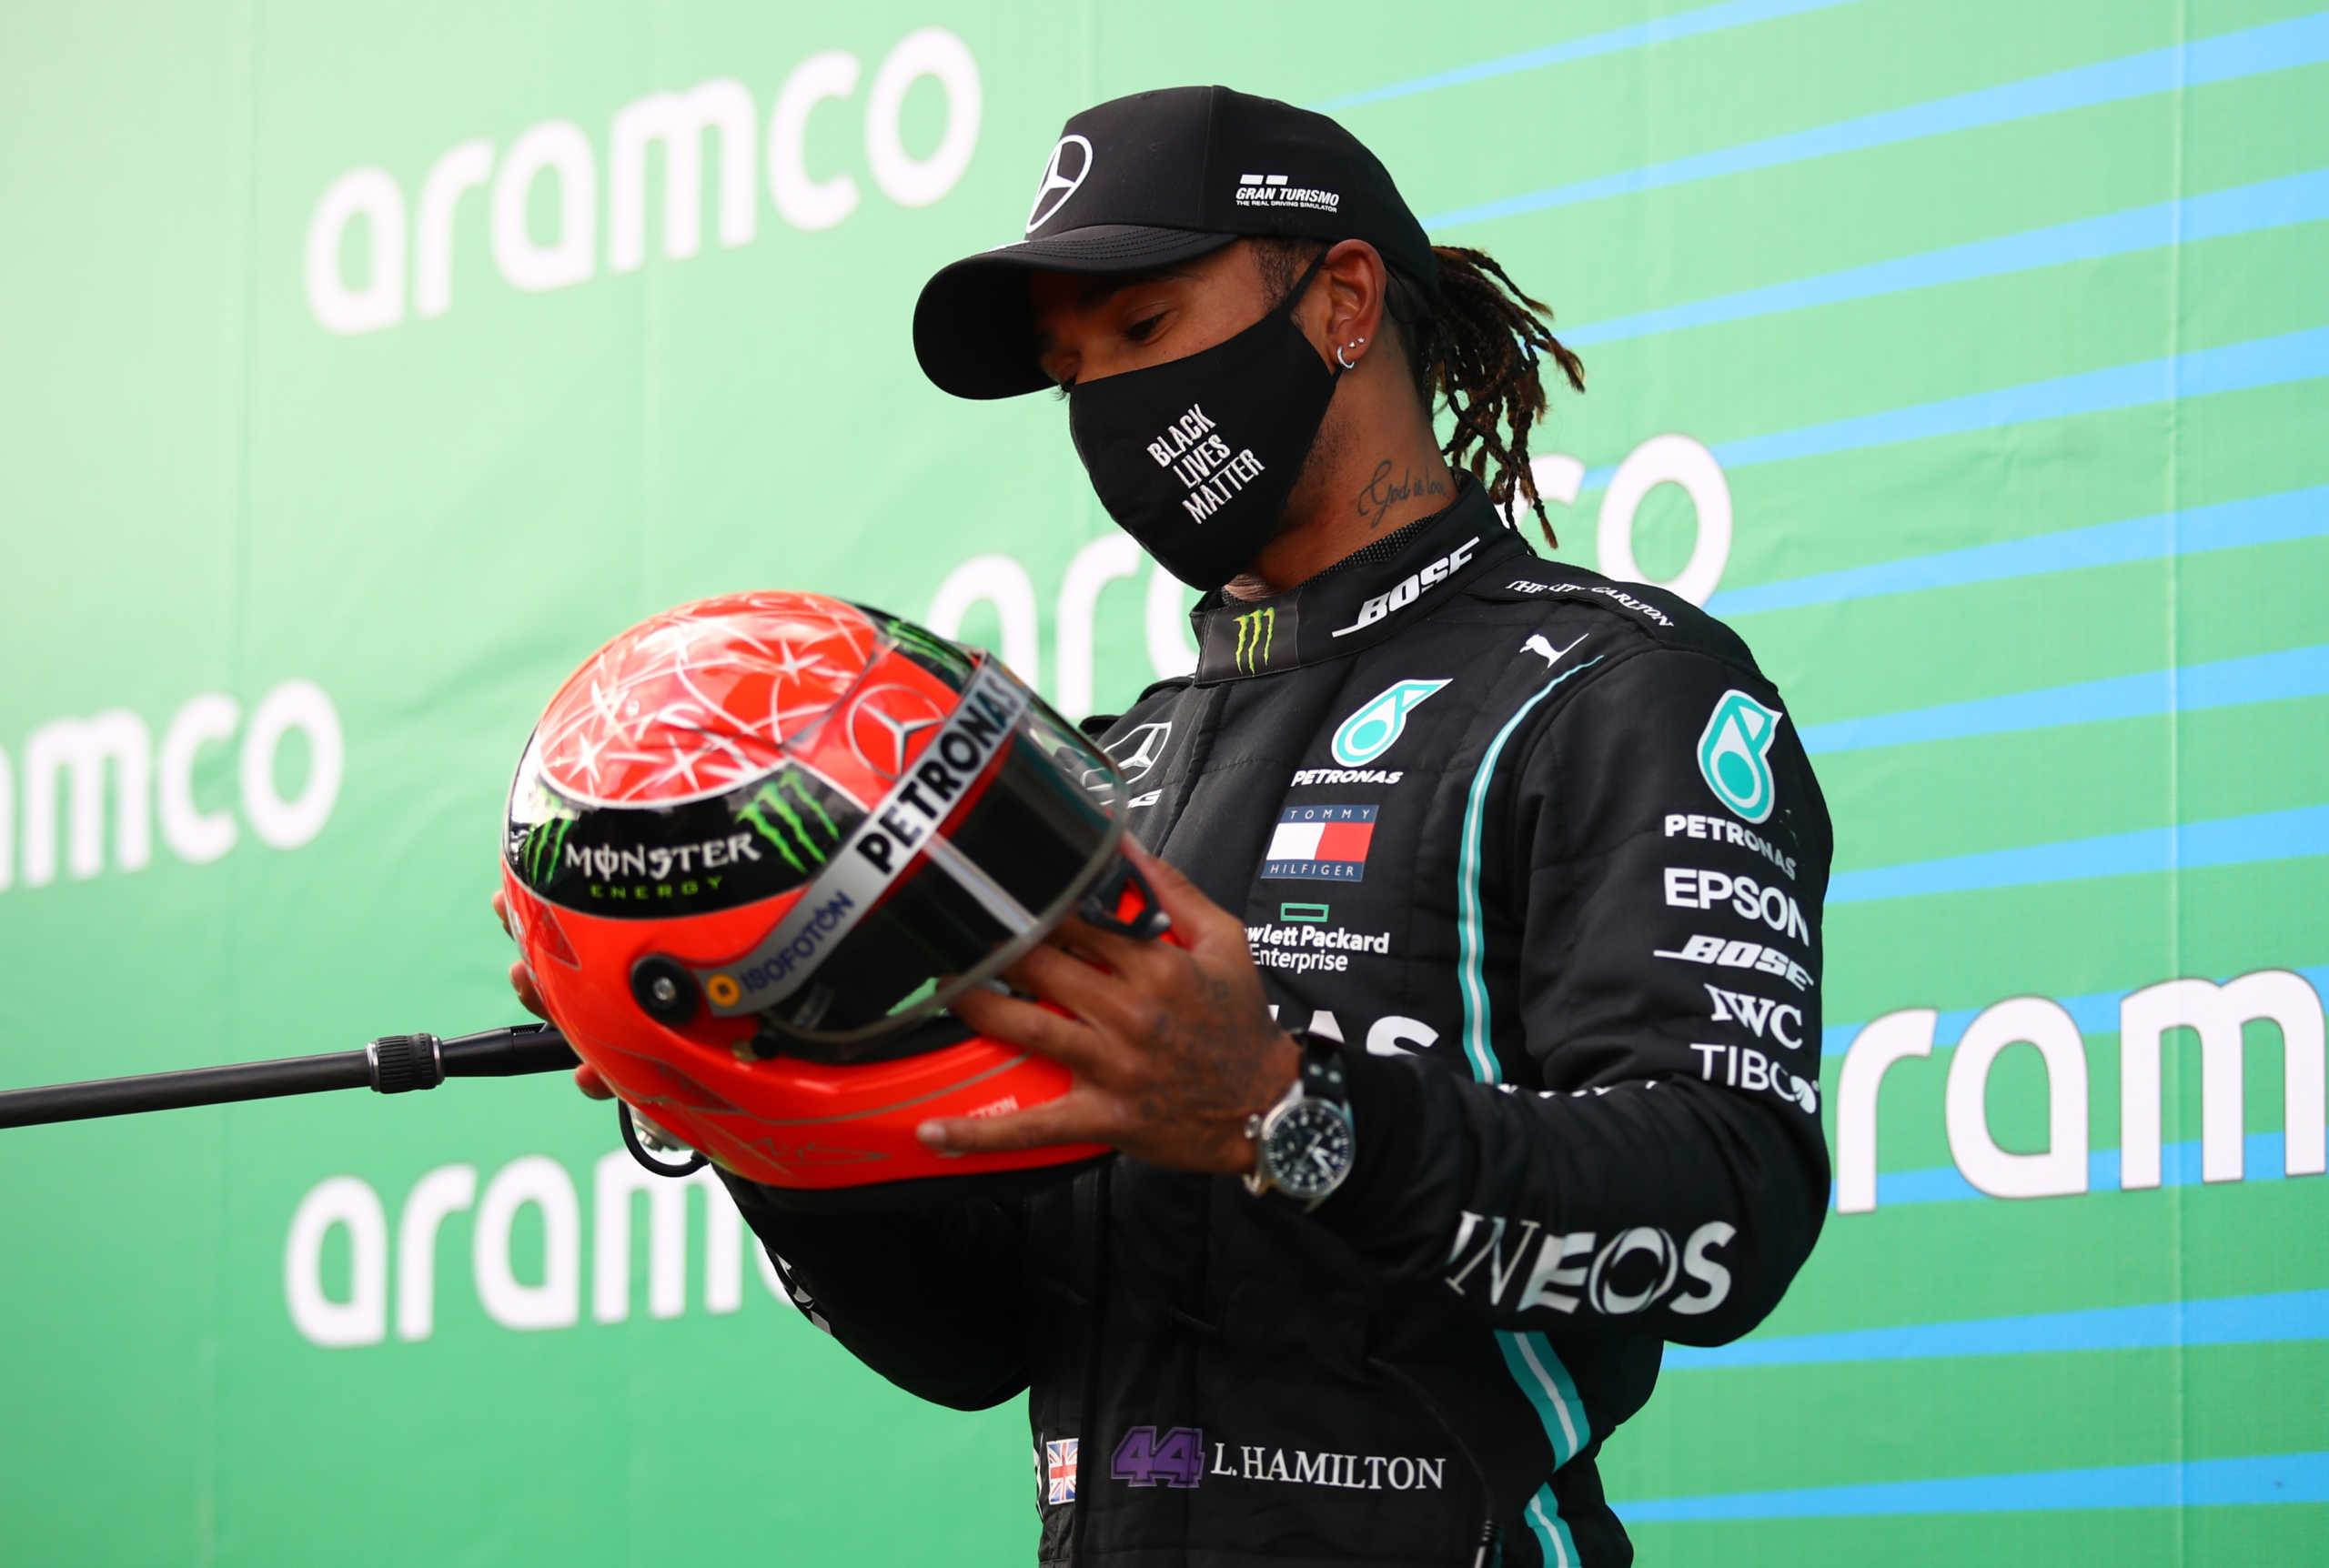 Formula 1: Συγκίνησε ο Μικ Σουμάχερ! Έδωσε το κράνος του πατέρα του στον Χάμιλτον (video)